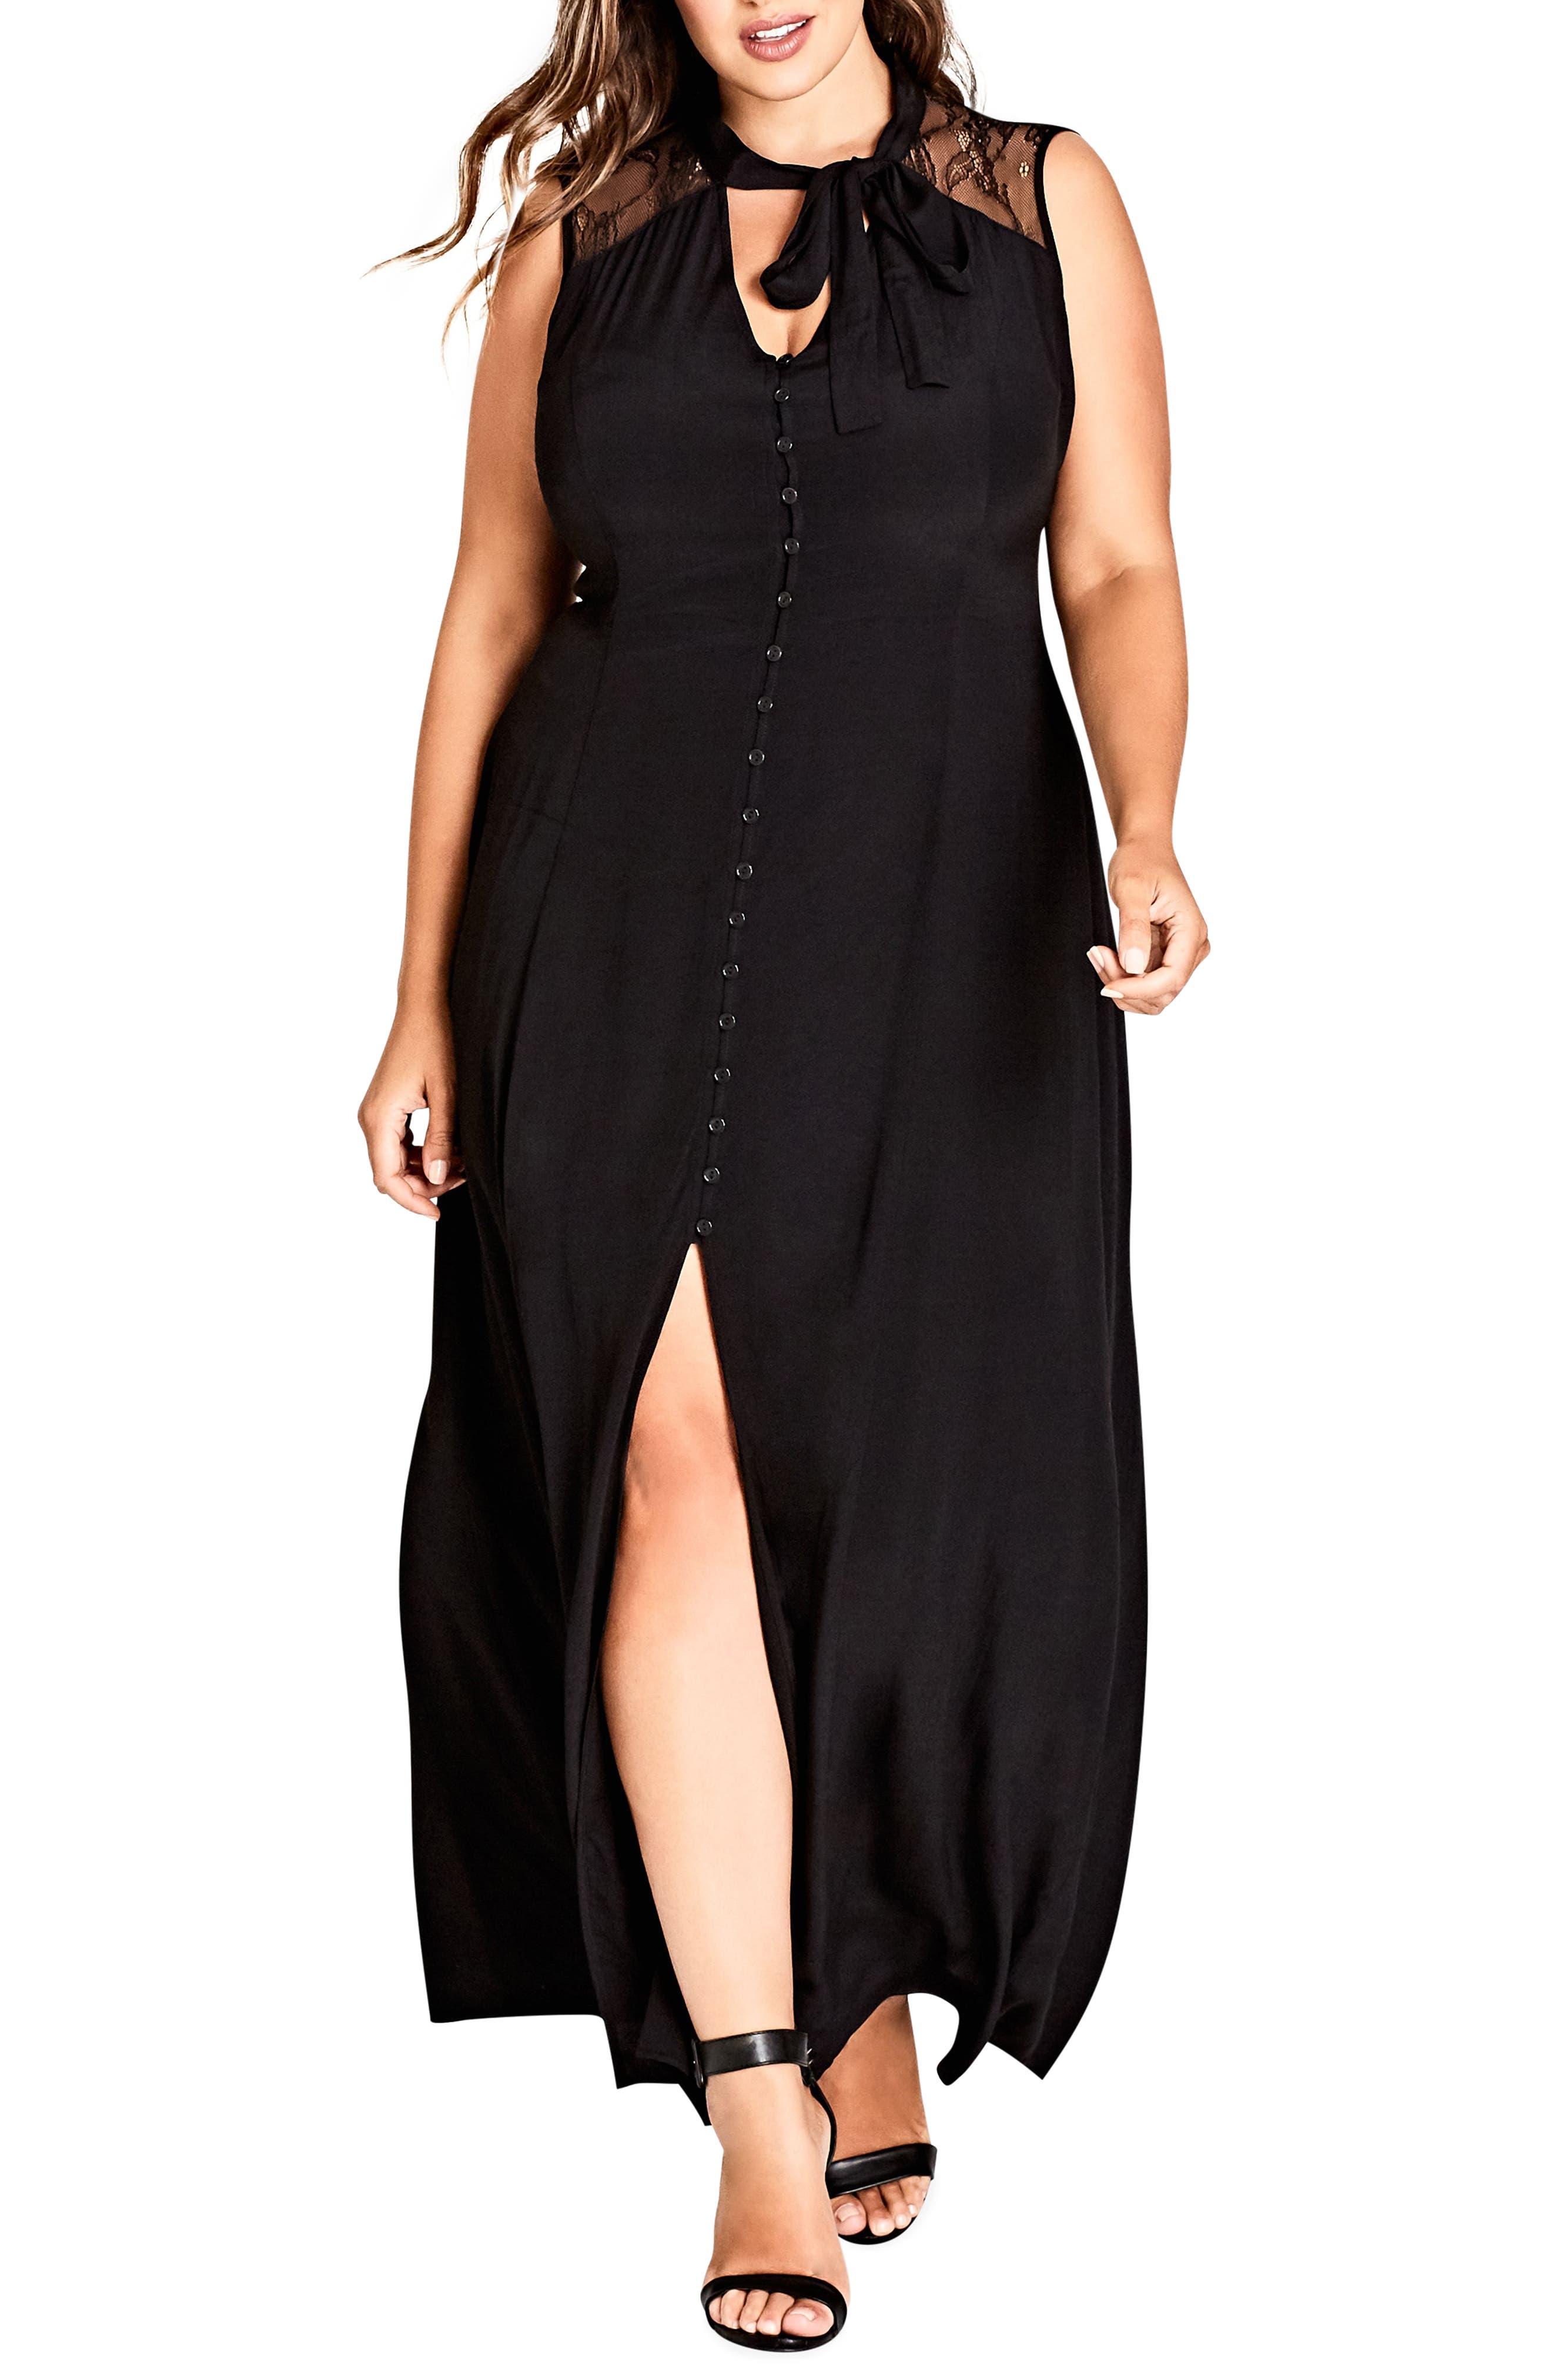 Makishi Sleeveless Maxi Dress,                             Main thumbnail 1, color,                             BLACK